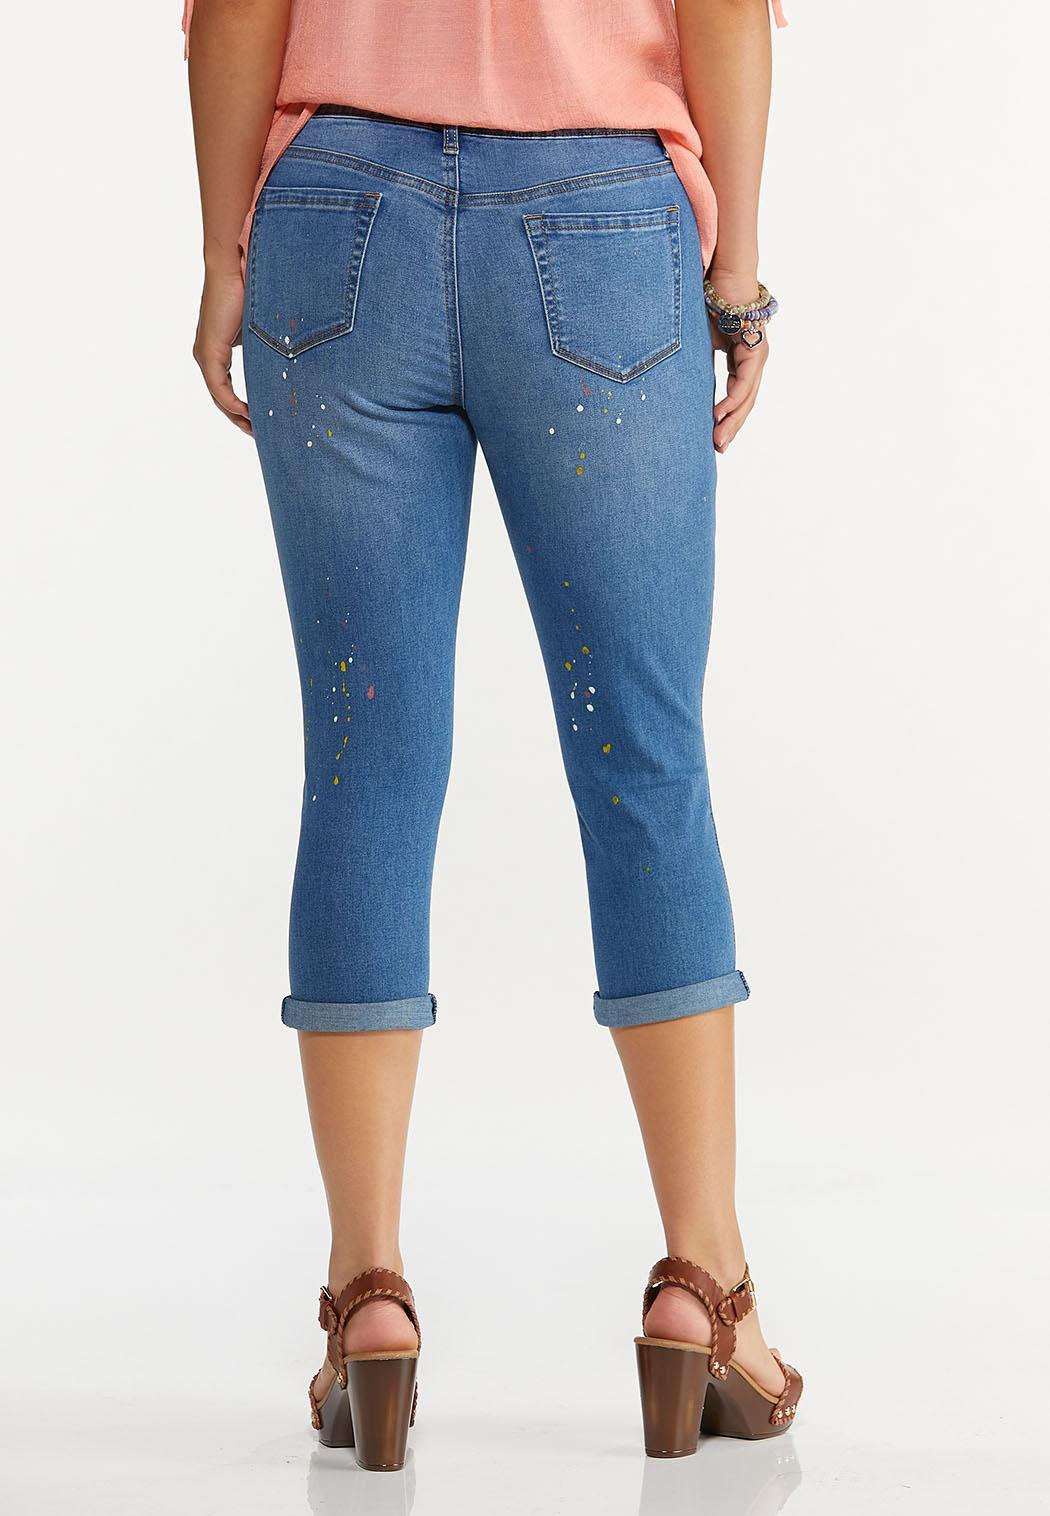 Cropped Paint Splatter Jeans (Item #44594237)